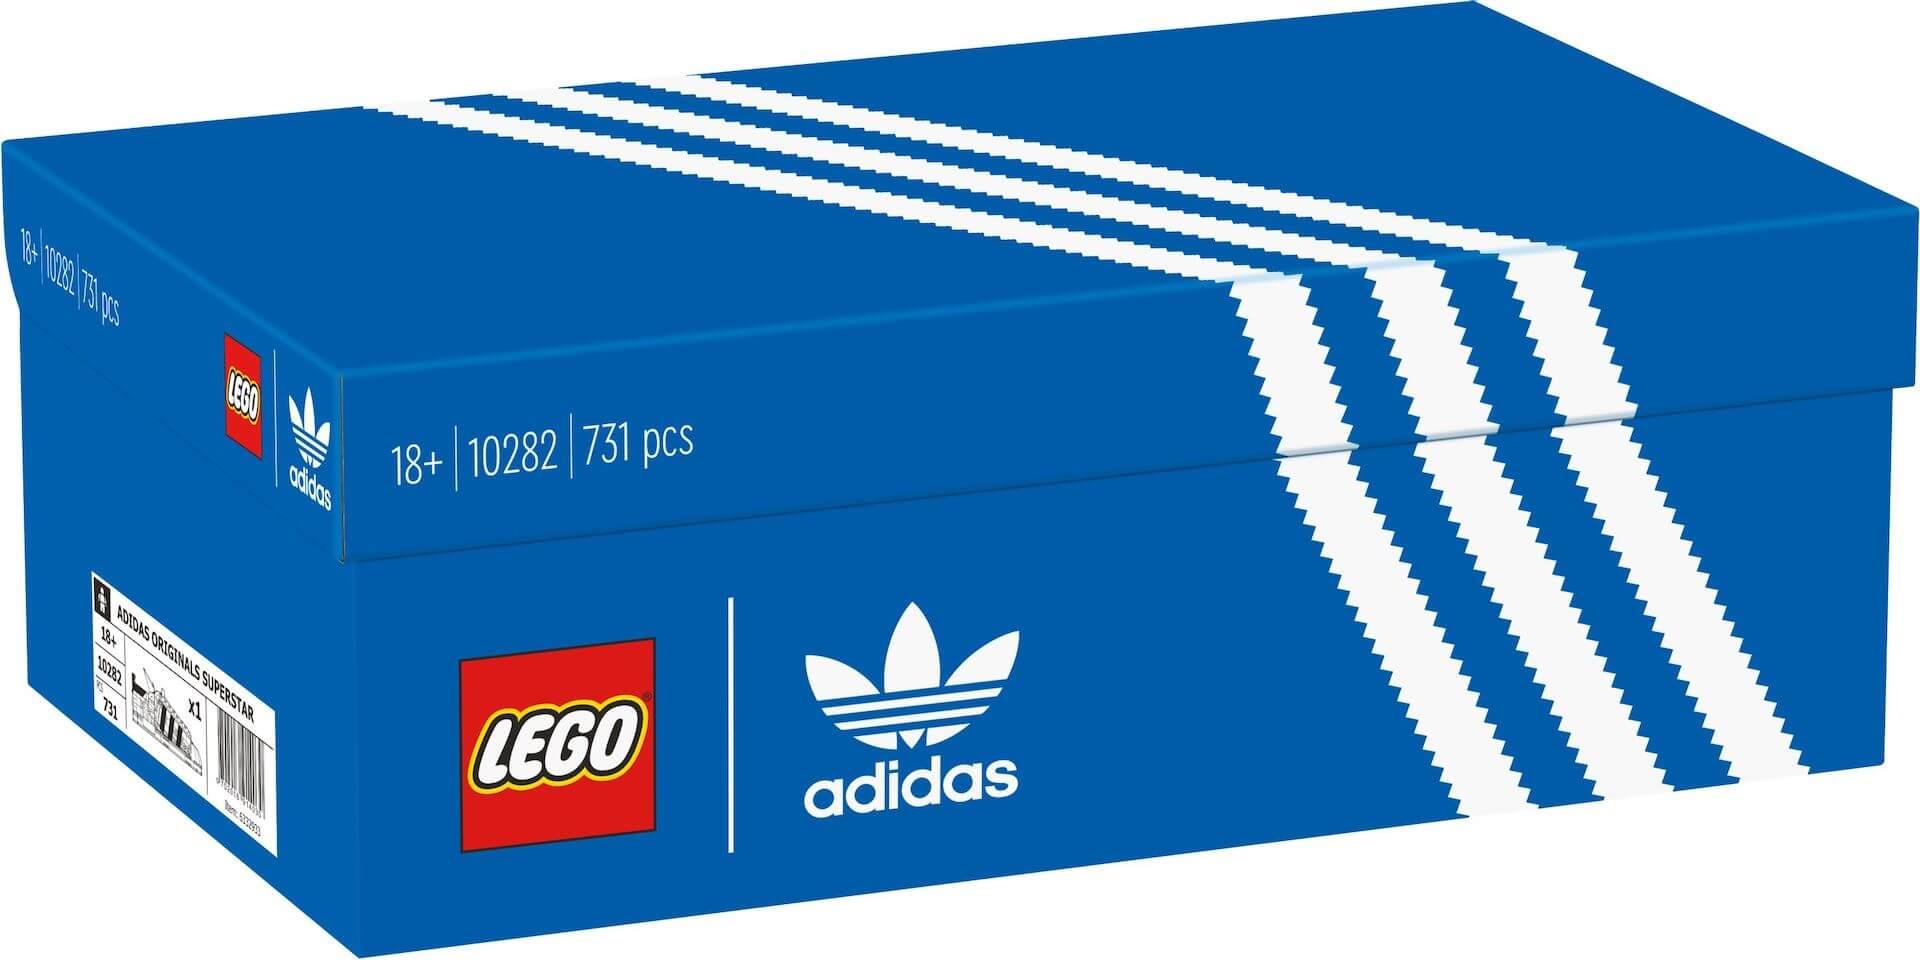 adidas Originalsとレゴのコラボアイテム「レゴ アディダス オリジナルス スーパースター」が発売決定! life210615_adidasoriginals_lego_3